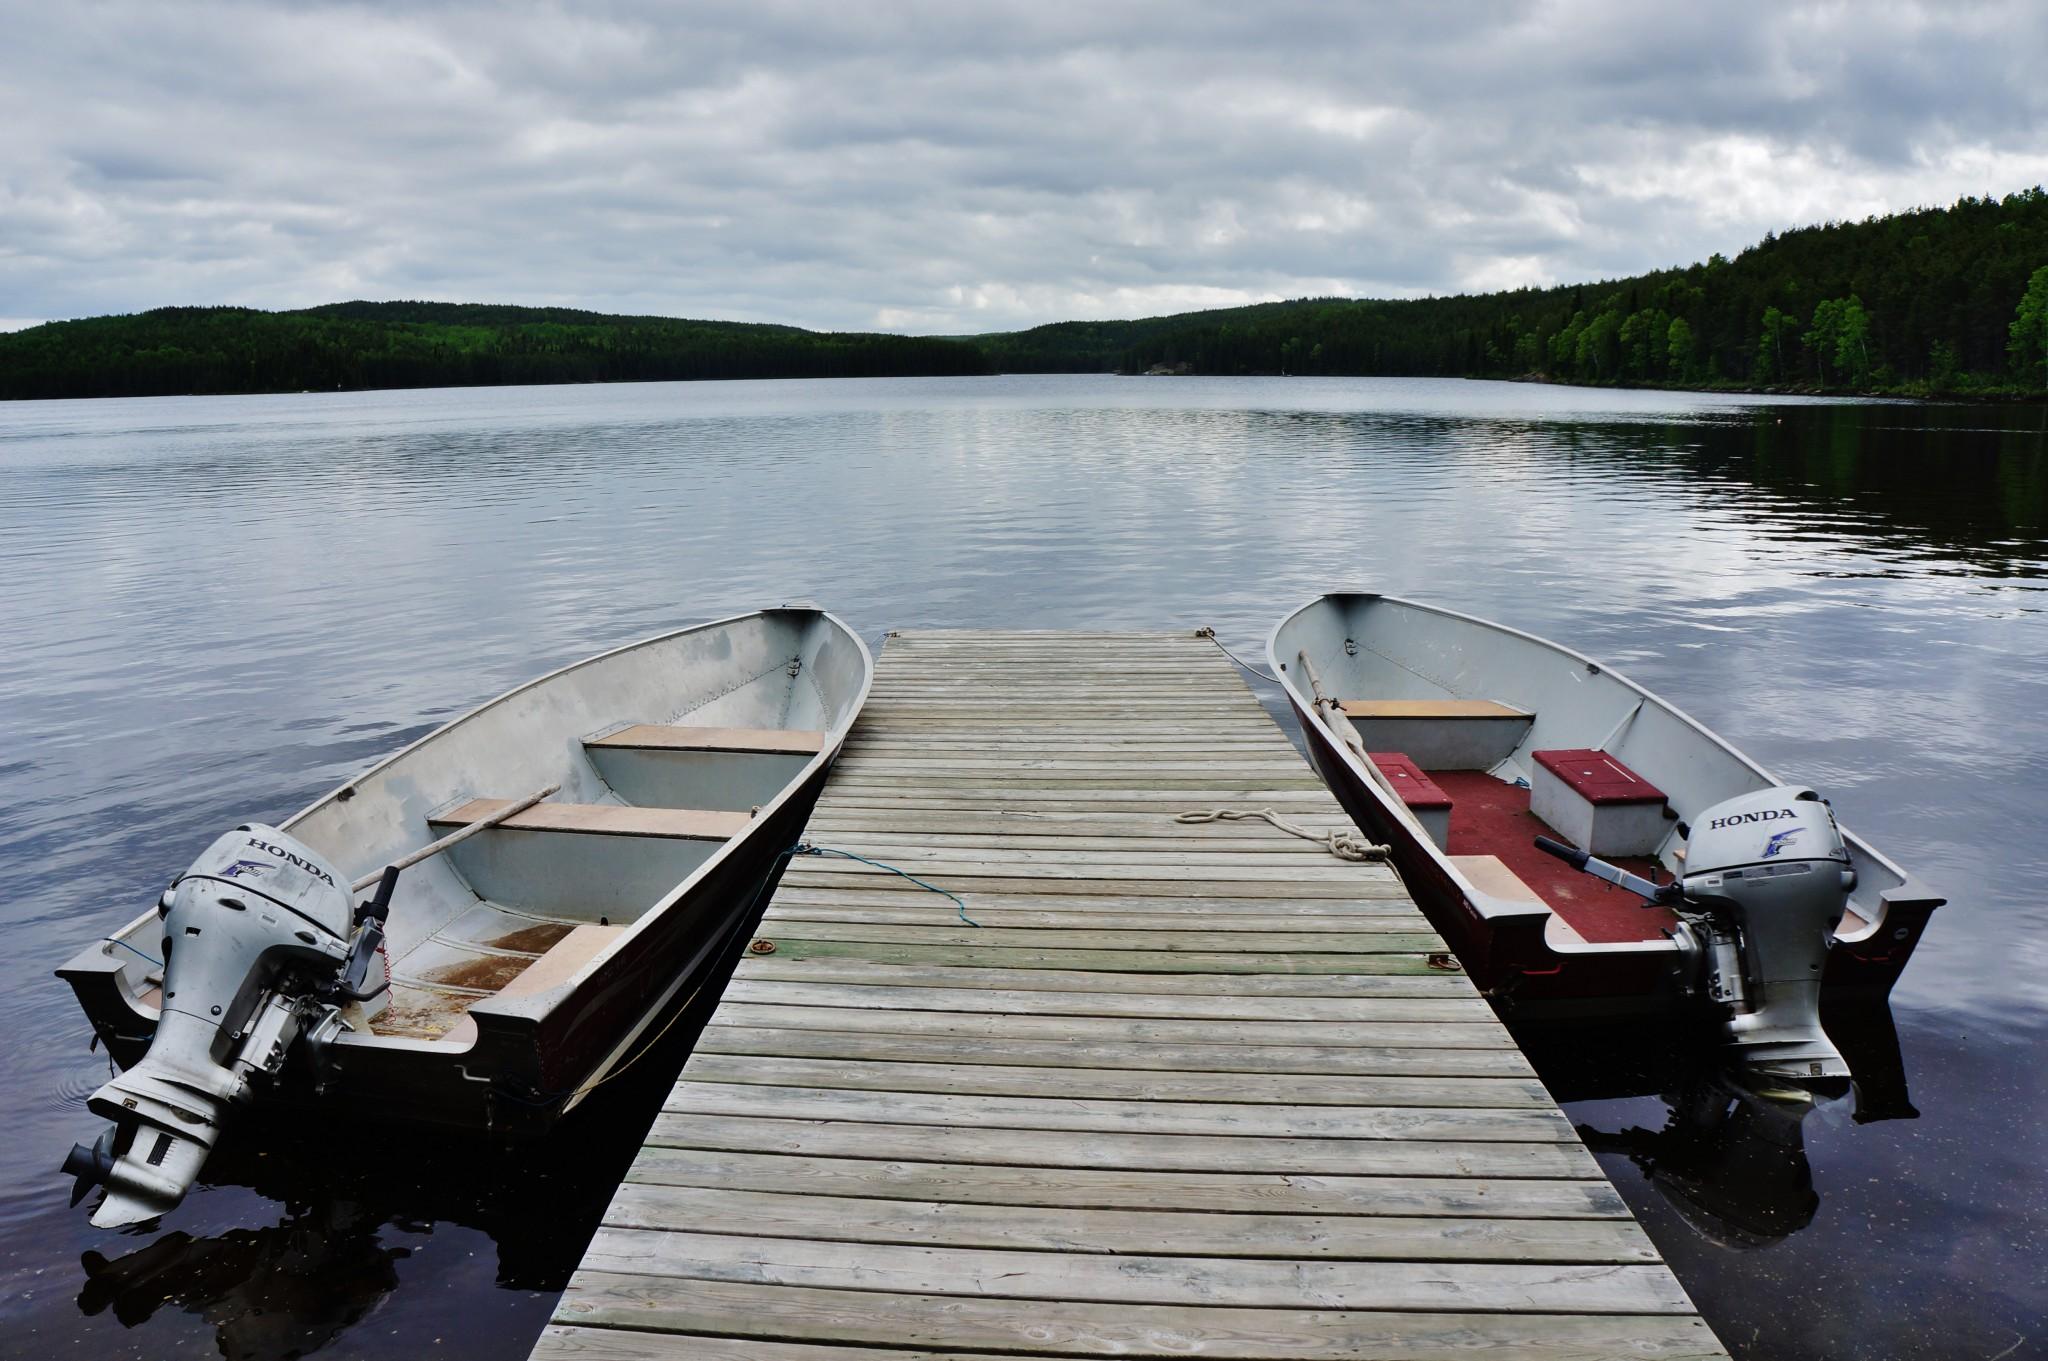 Facilities - IISD Experimental Lakes Area